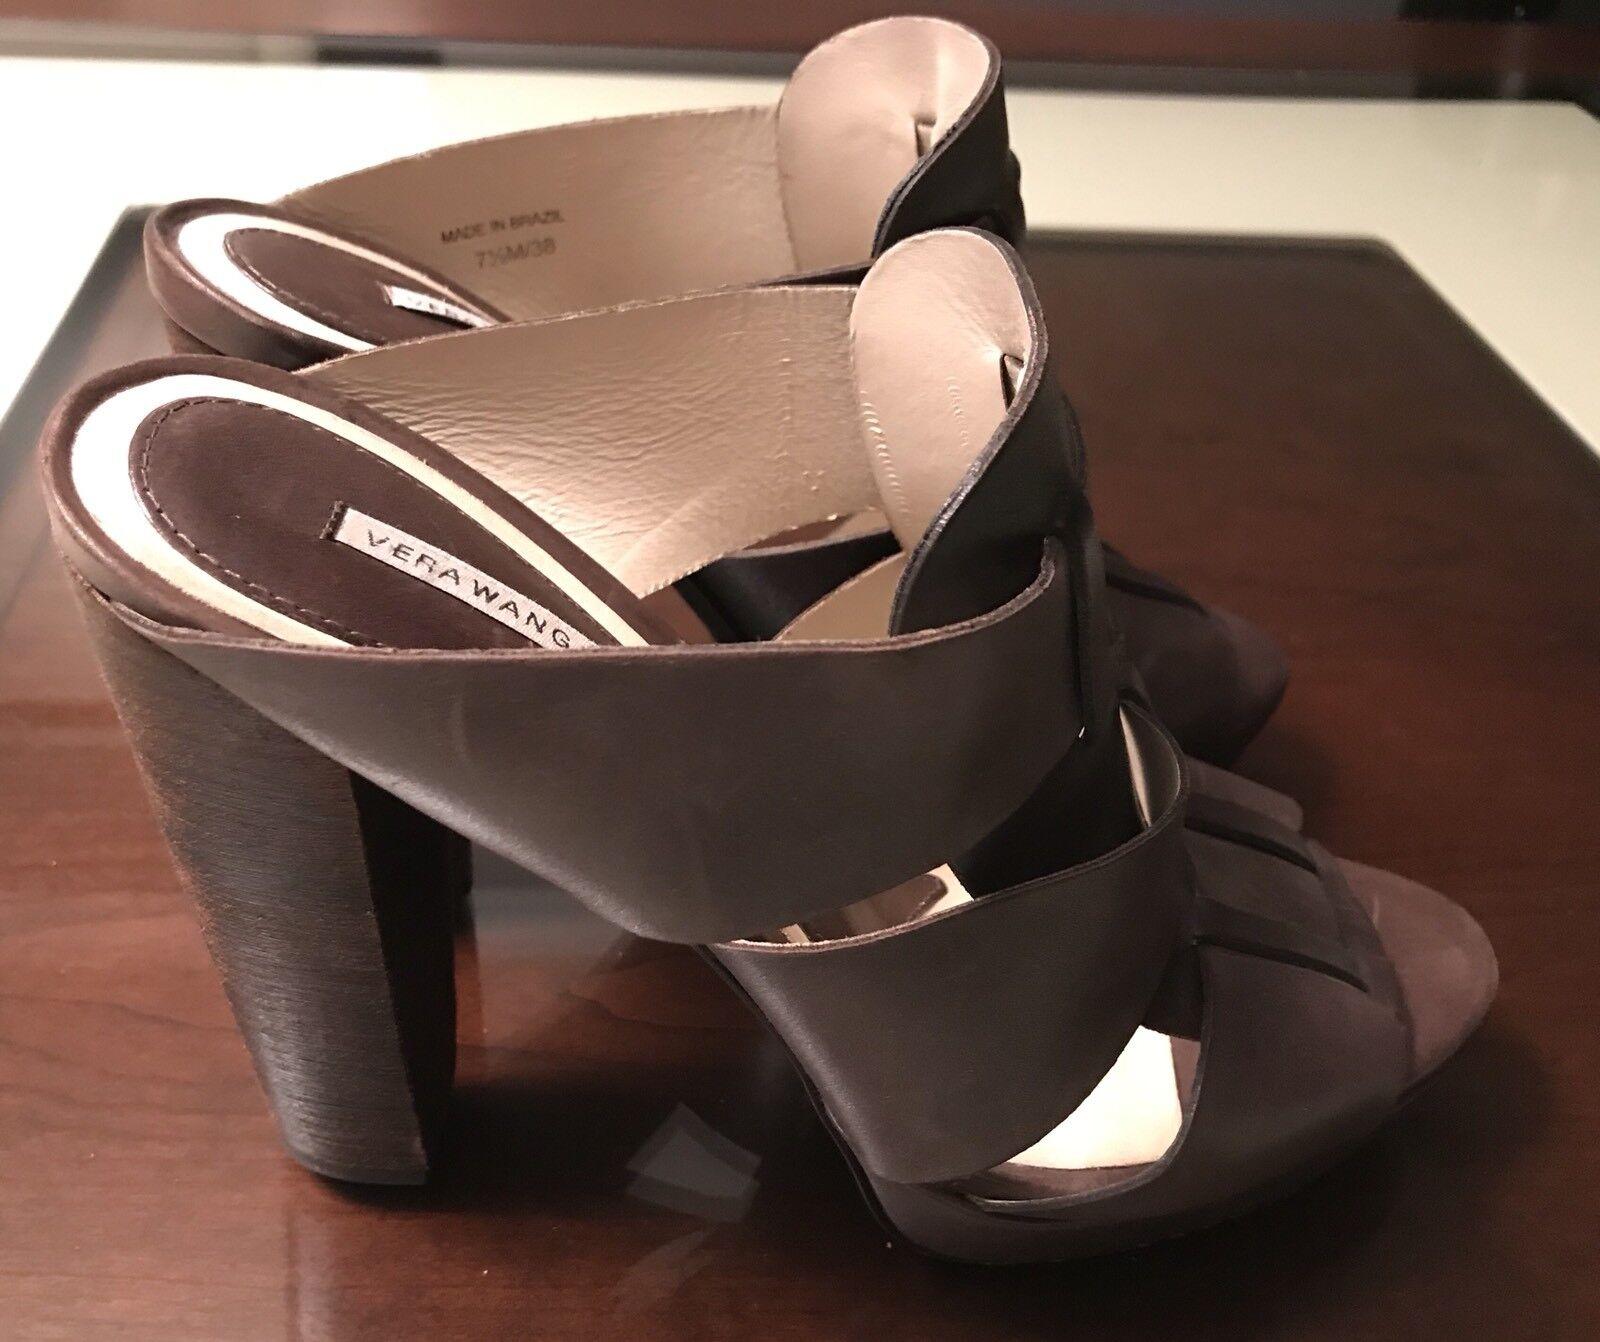 Vera Wang Lavender Label Heels Sandale Leder Braun 38 7.5